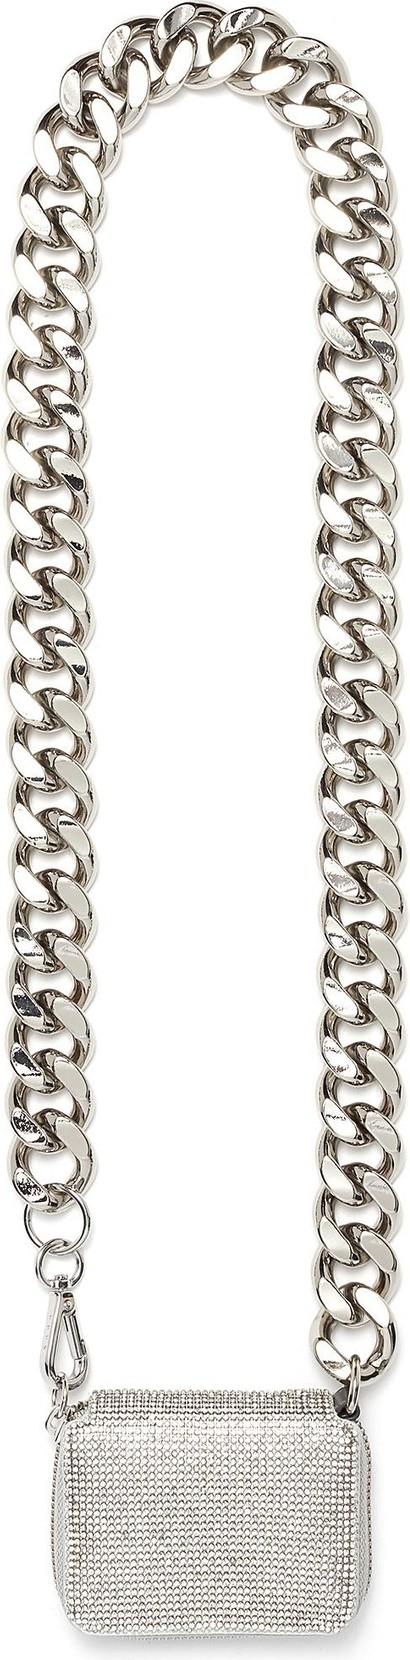 KARA Biker chain crystal mesh wallet